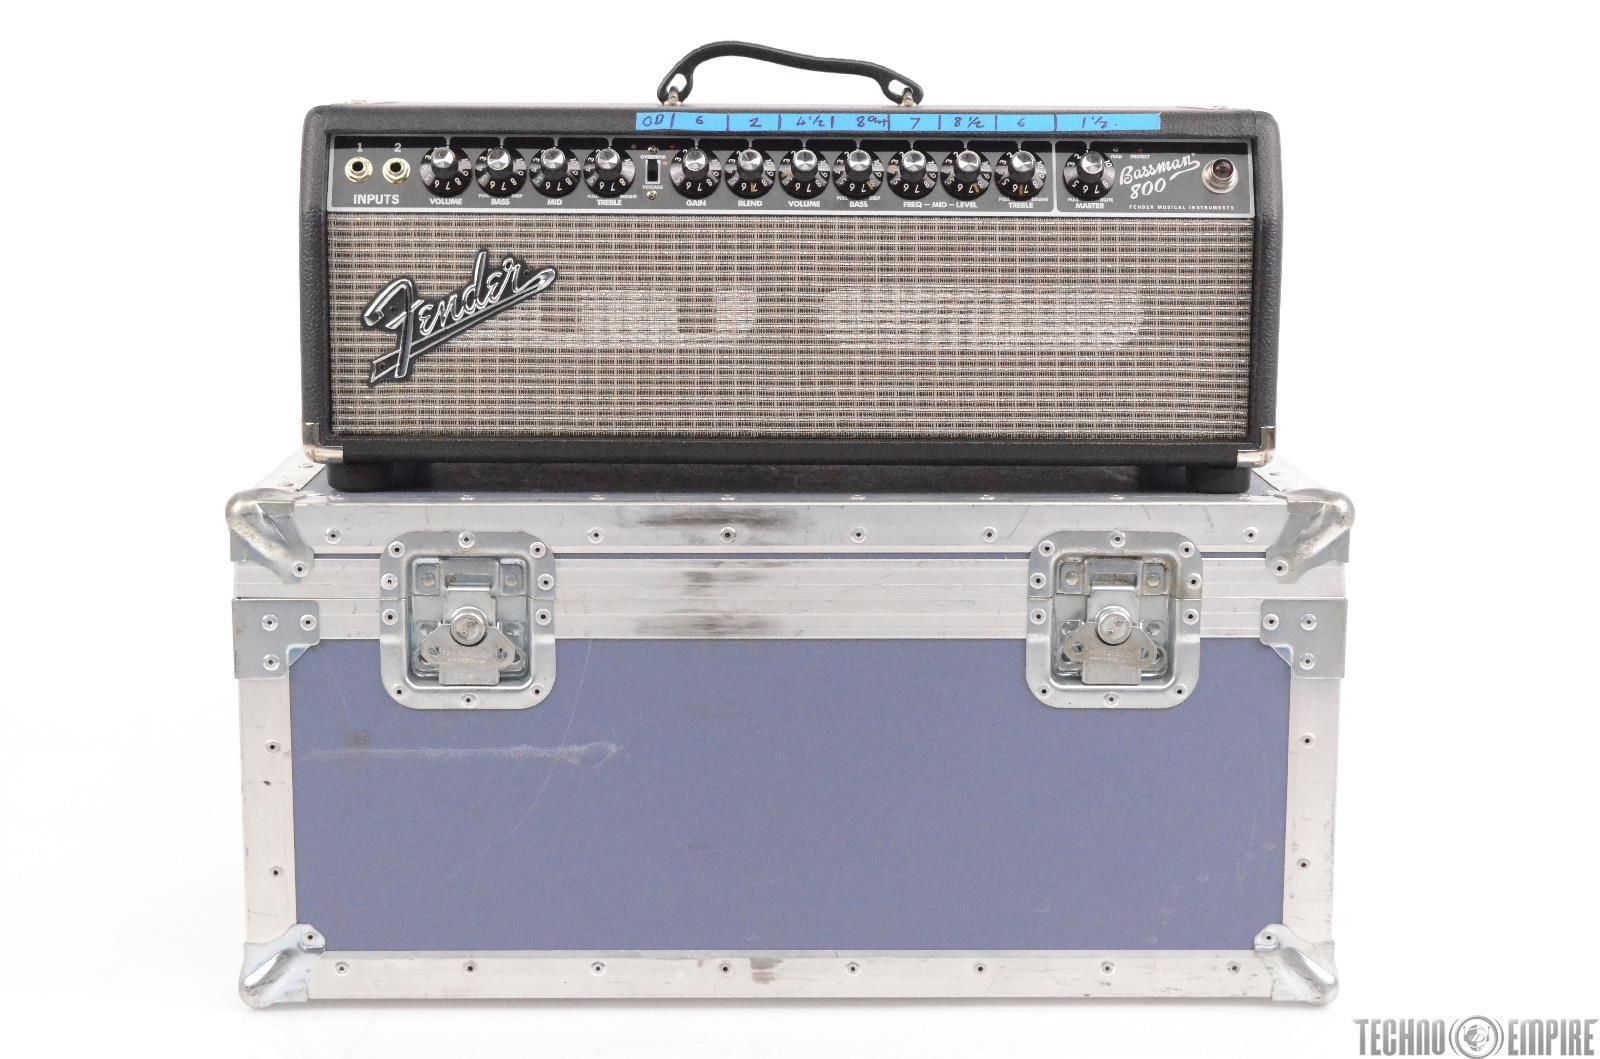 Fender Bassman 800 Bass Amplifier Amp Head w/ ATA Road Flight Case #29820